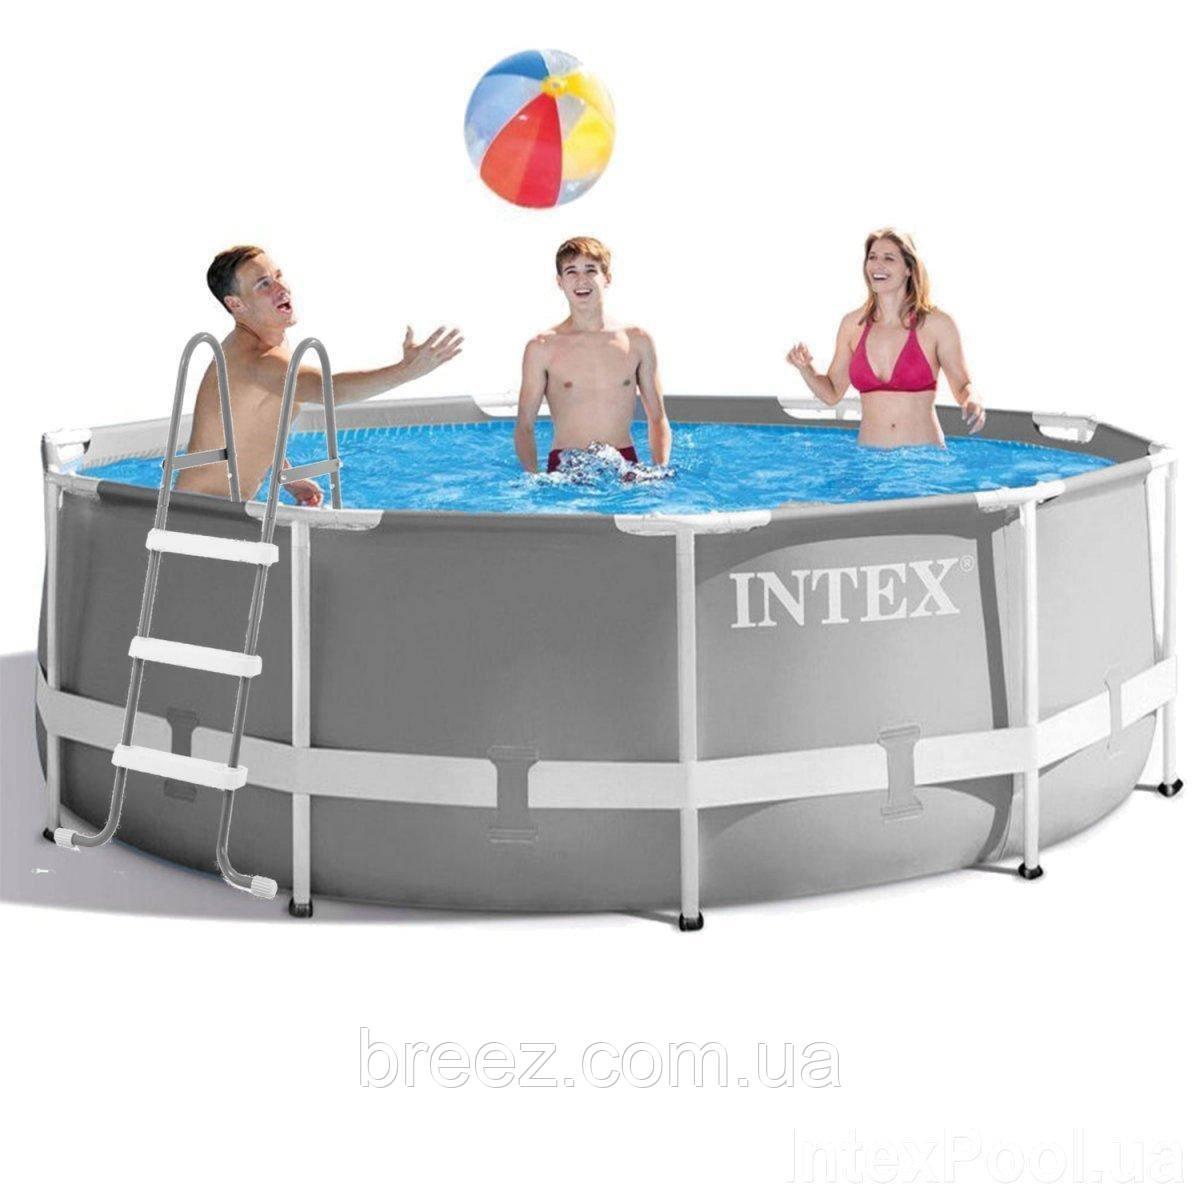 Каркасный бассейн Intex 26706-1 305 x 99 см лестница